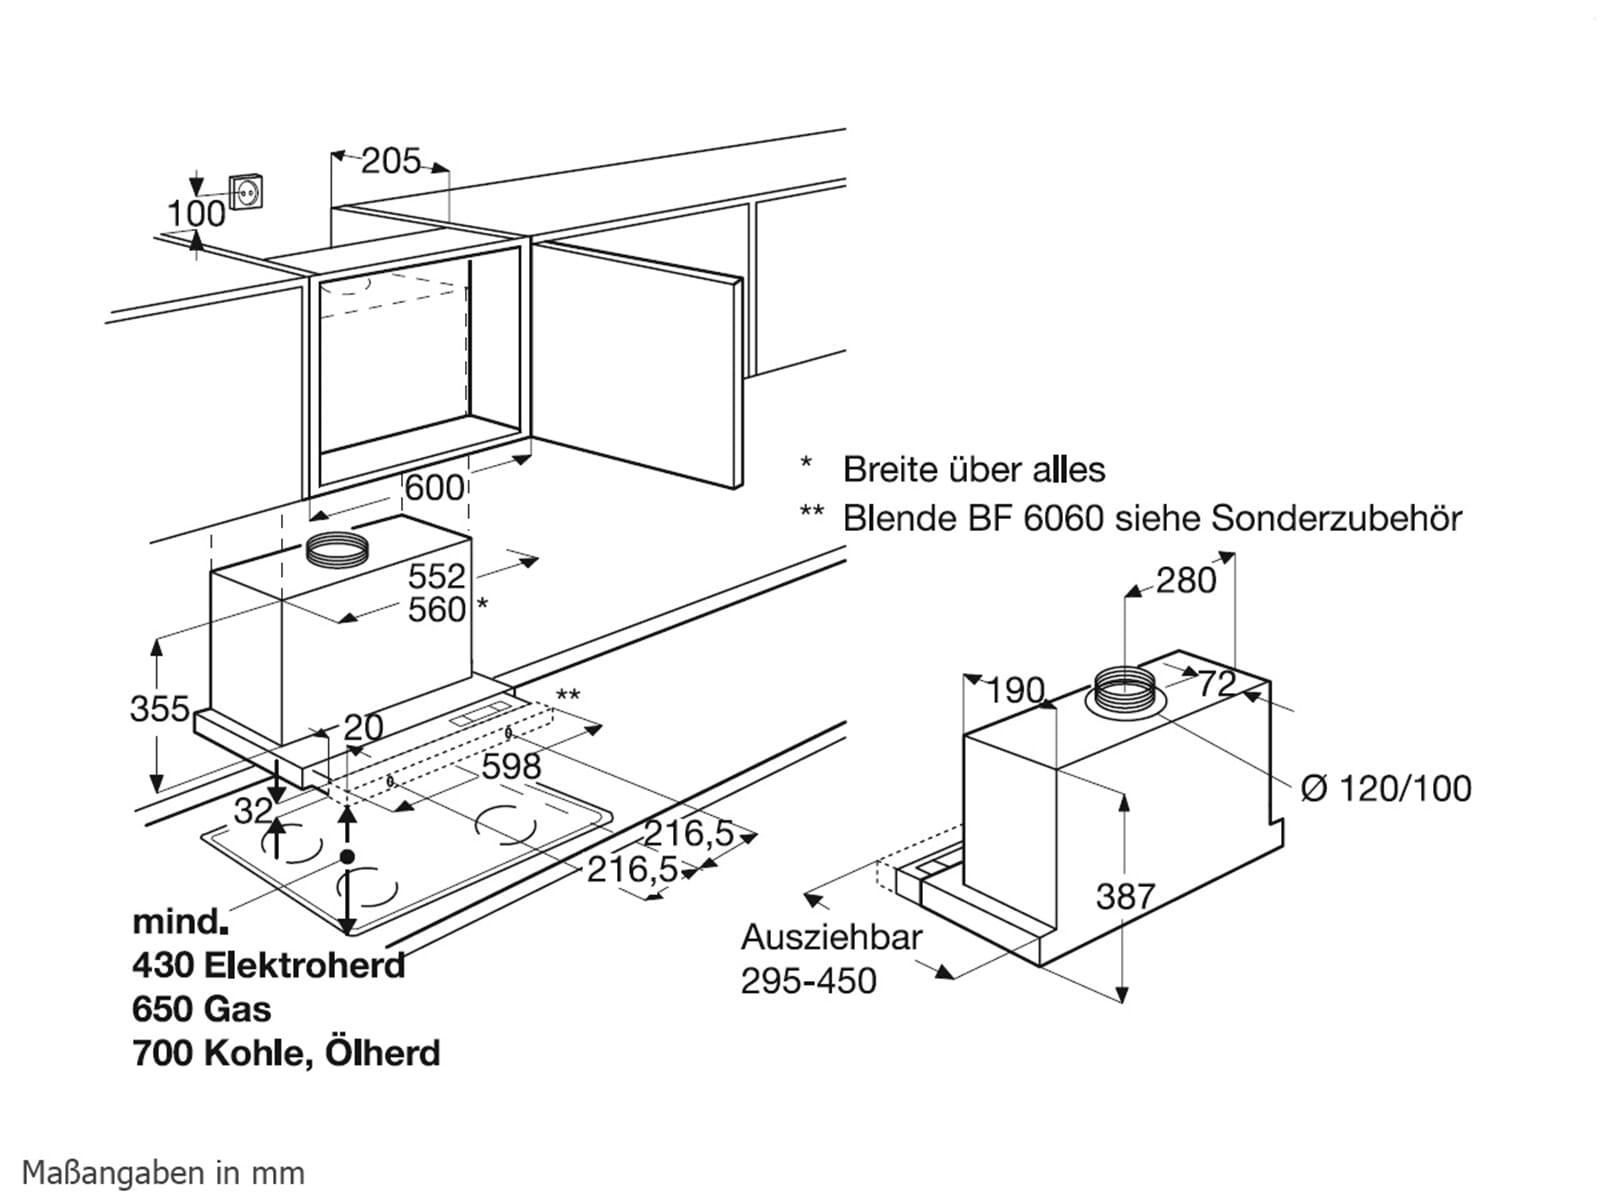 aeg df6160 ml flachschirmhaube flachschirm dunstabzug l fter grau dunsthaube 7332543201822 ebay. Black Bedroom Furniture Sets. Home Design Ideas